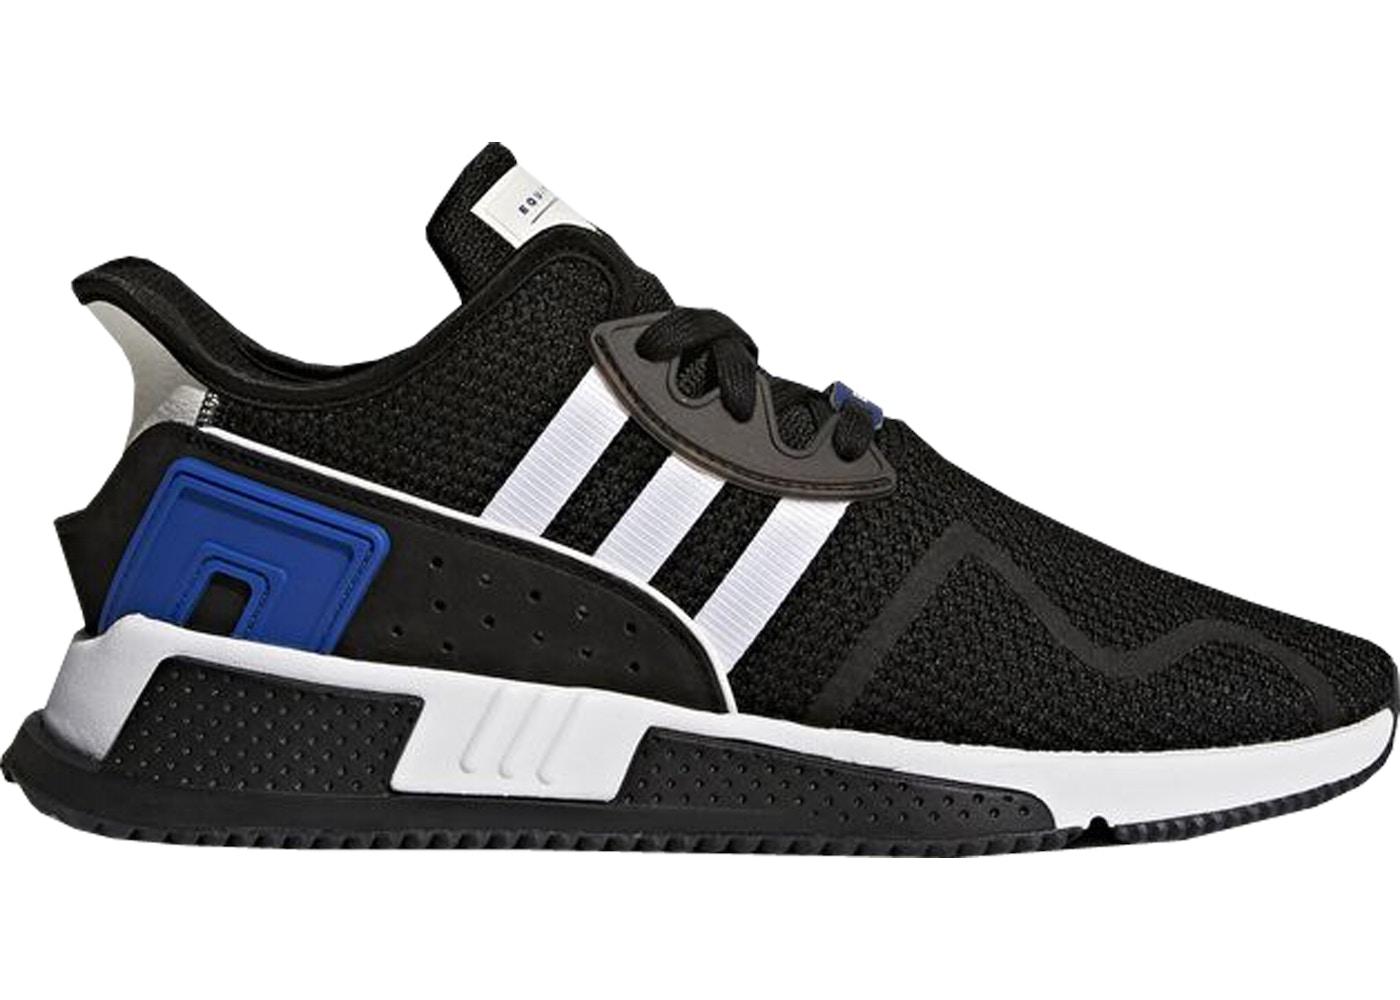 designer fashion 38fb0 9601b Buy adidas EQT Shoes & Deadstock Sneakers